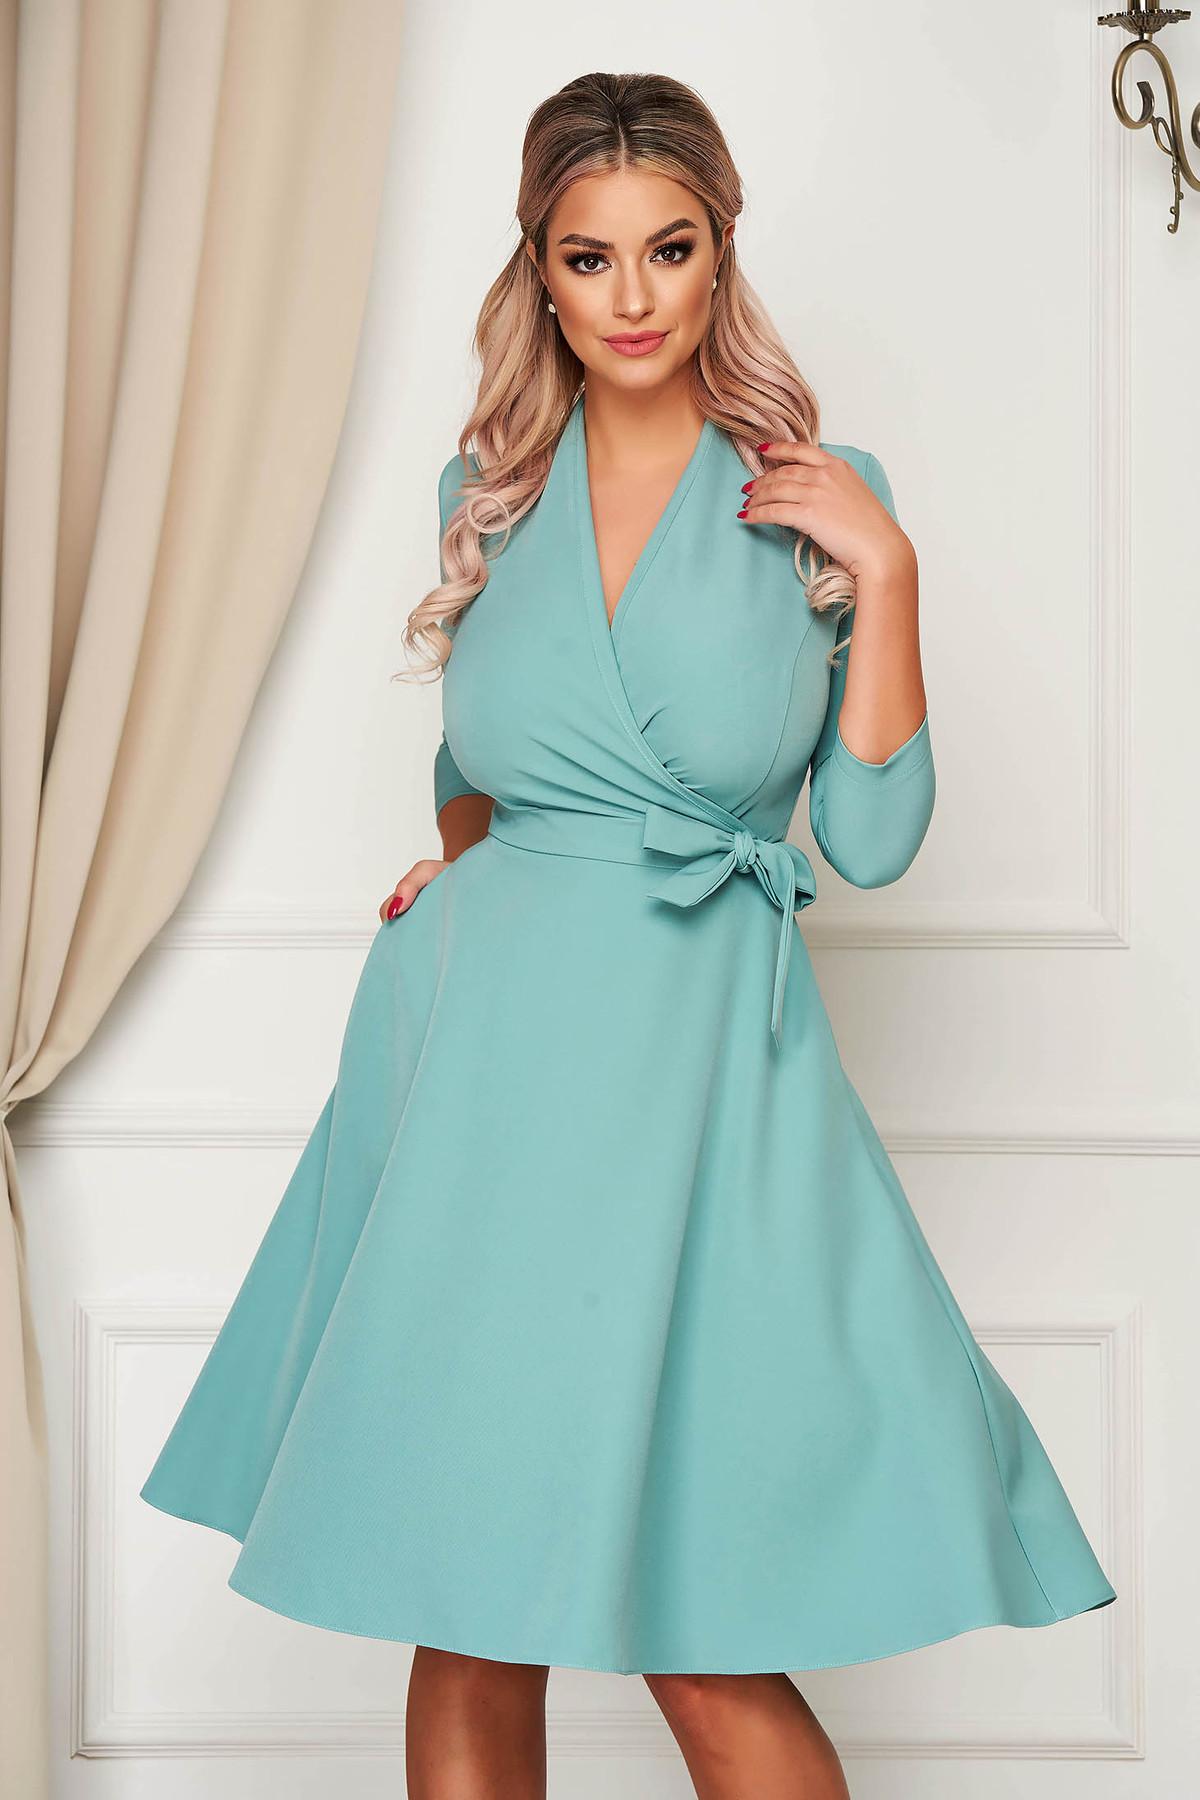 Rochie StarShinerS turcoaz eleganta midi in clos din stofa usor elastica cu buzunare